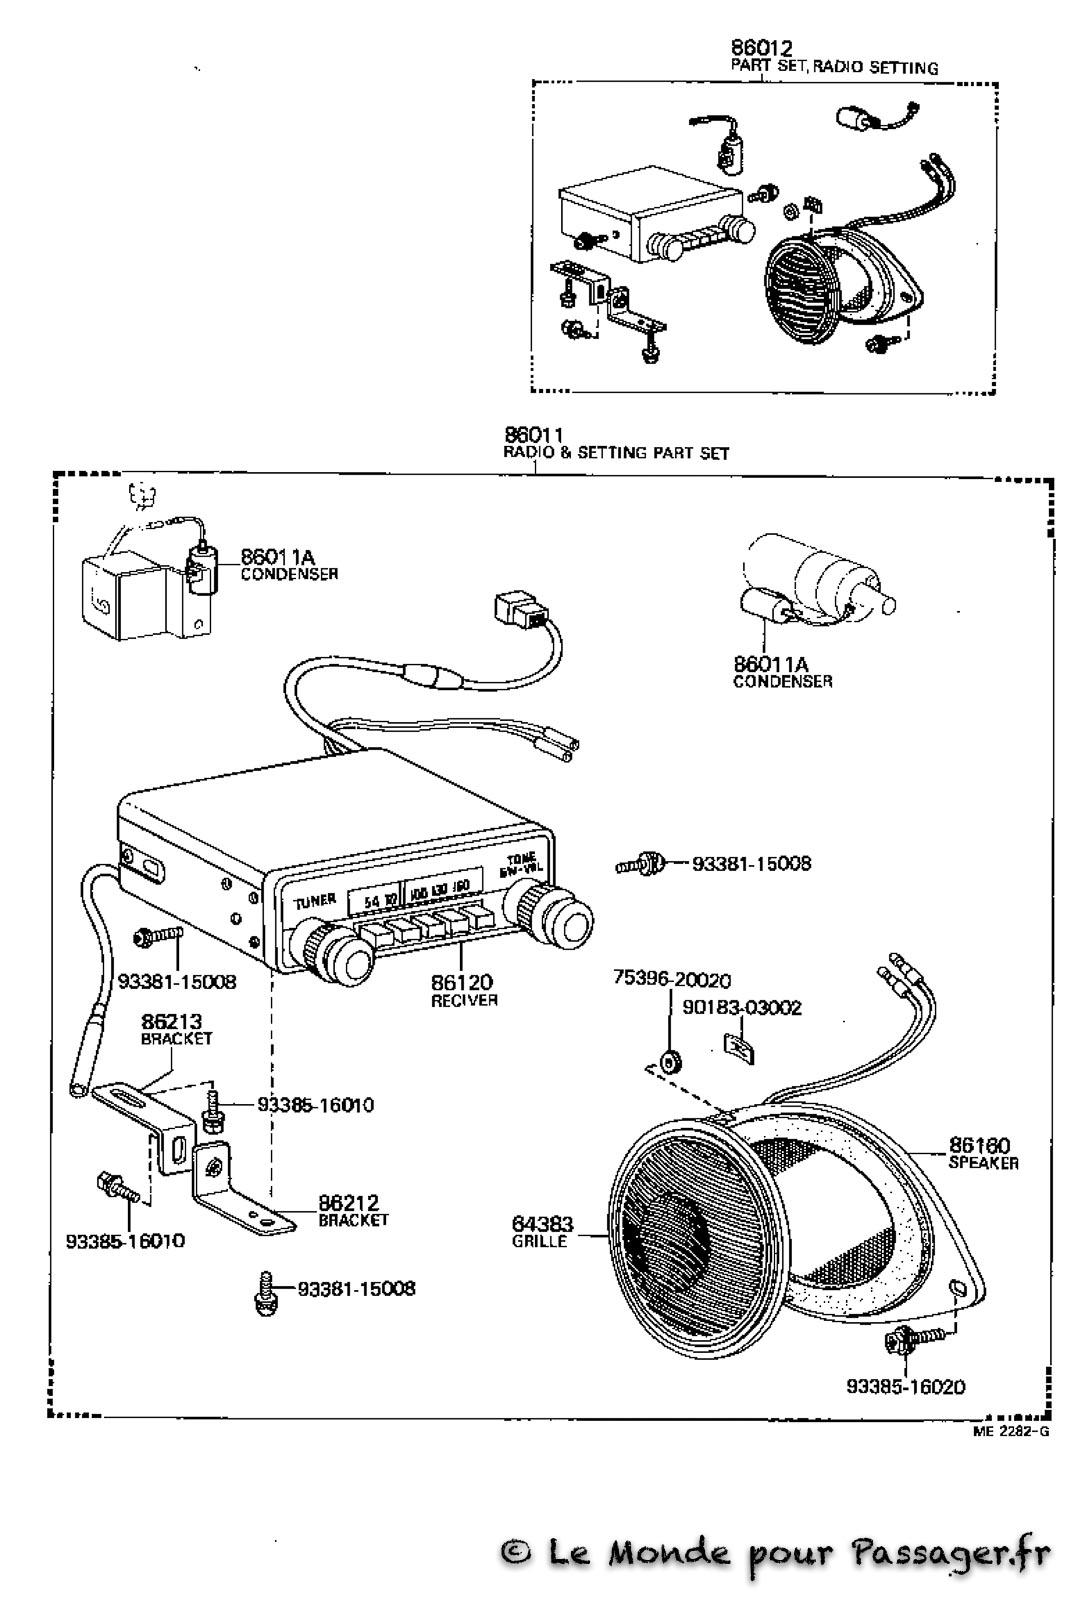 Fj55-Eclatés-Techniques147